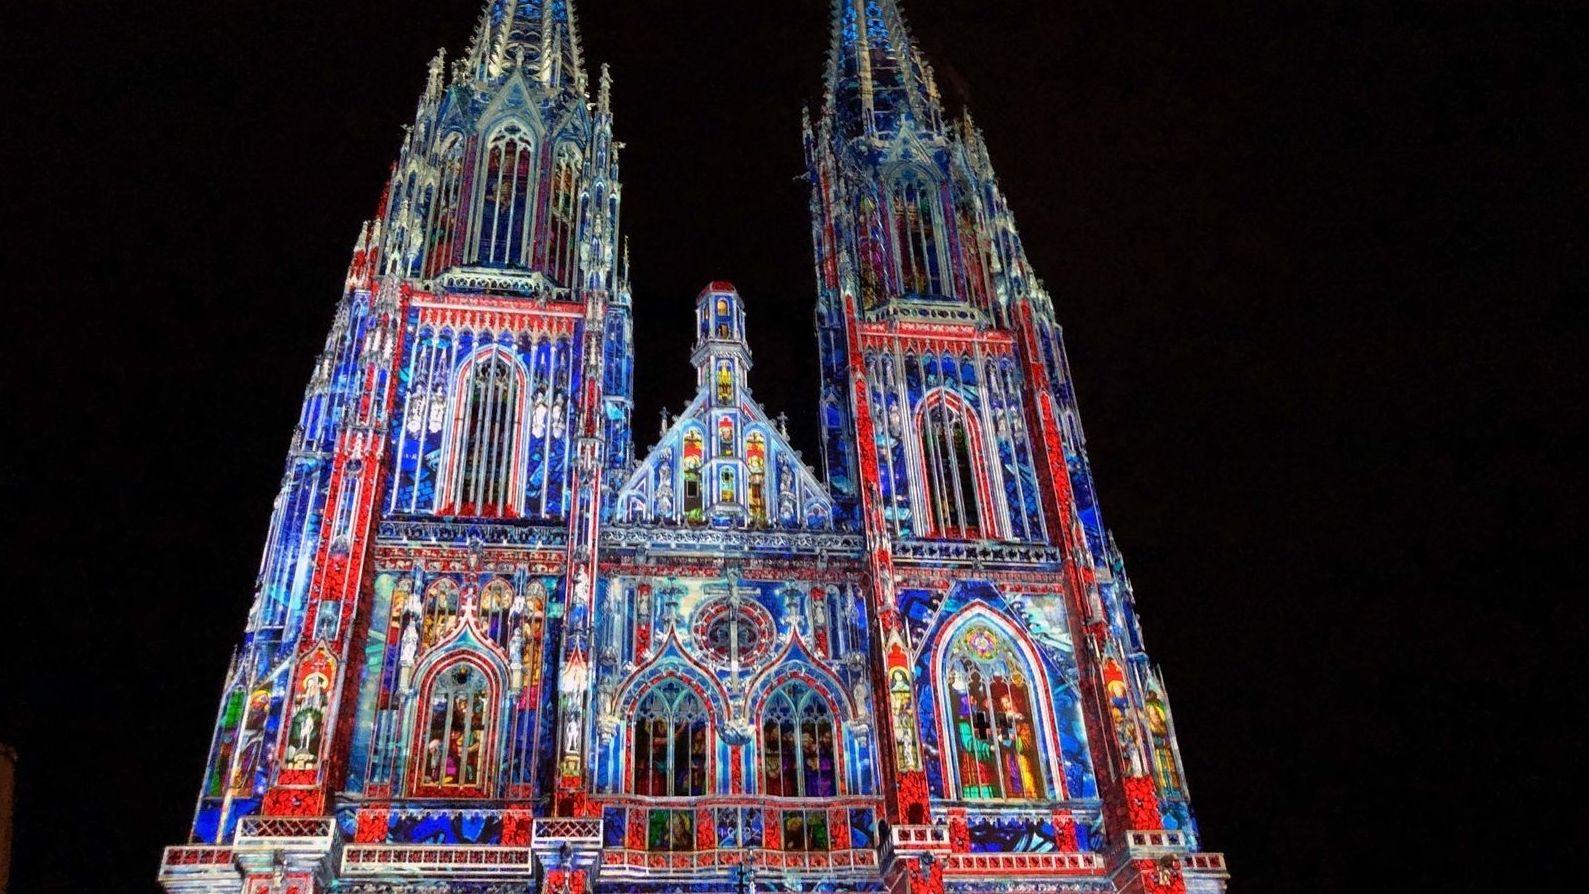 Der angestrahlte Dom in Regensburg